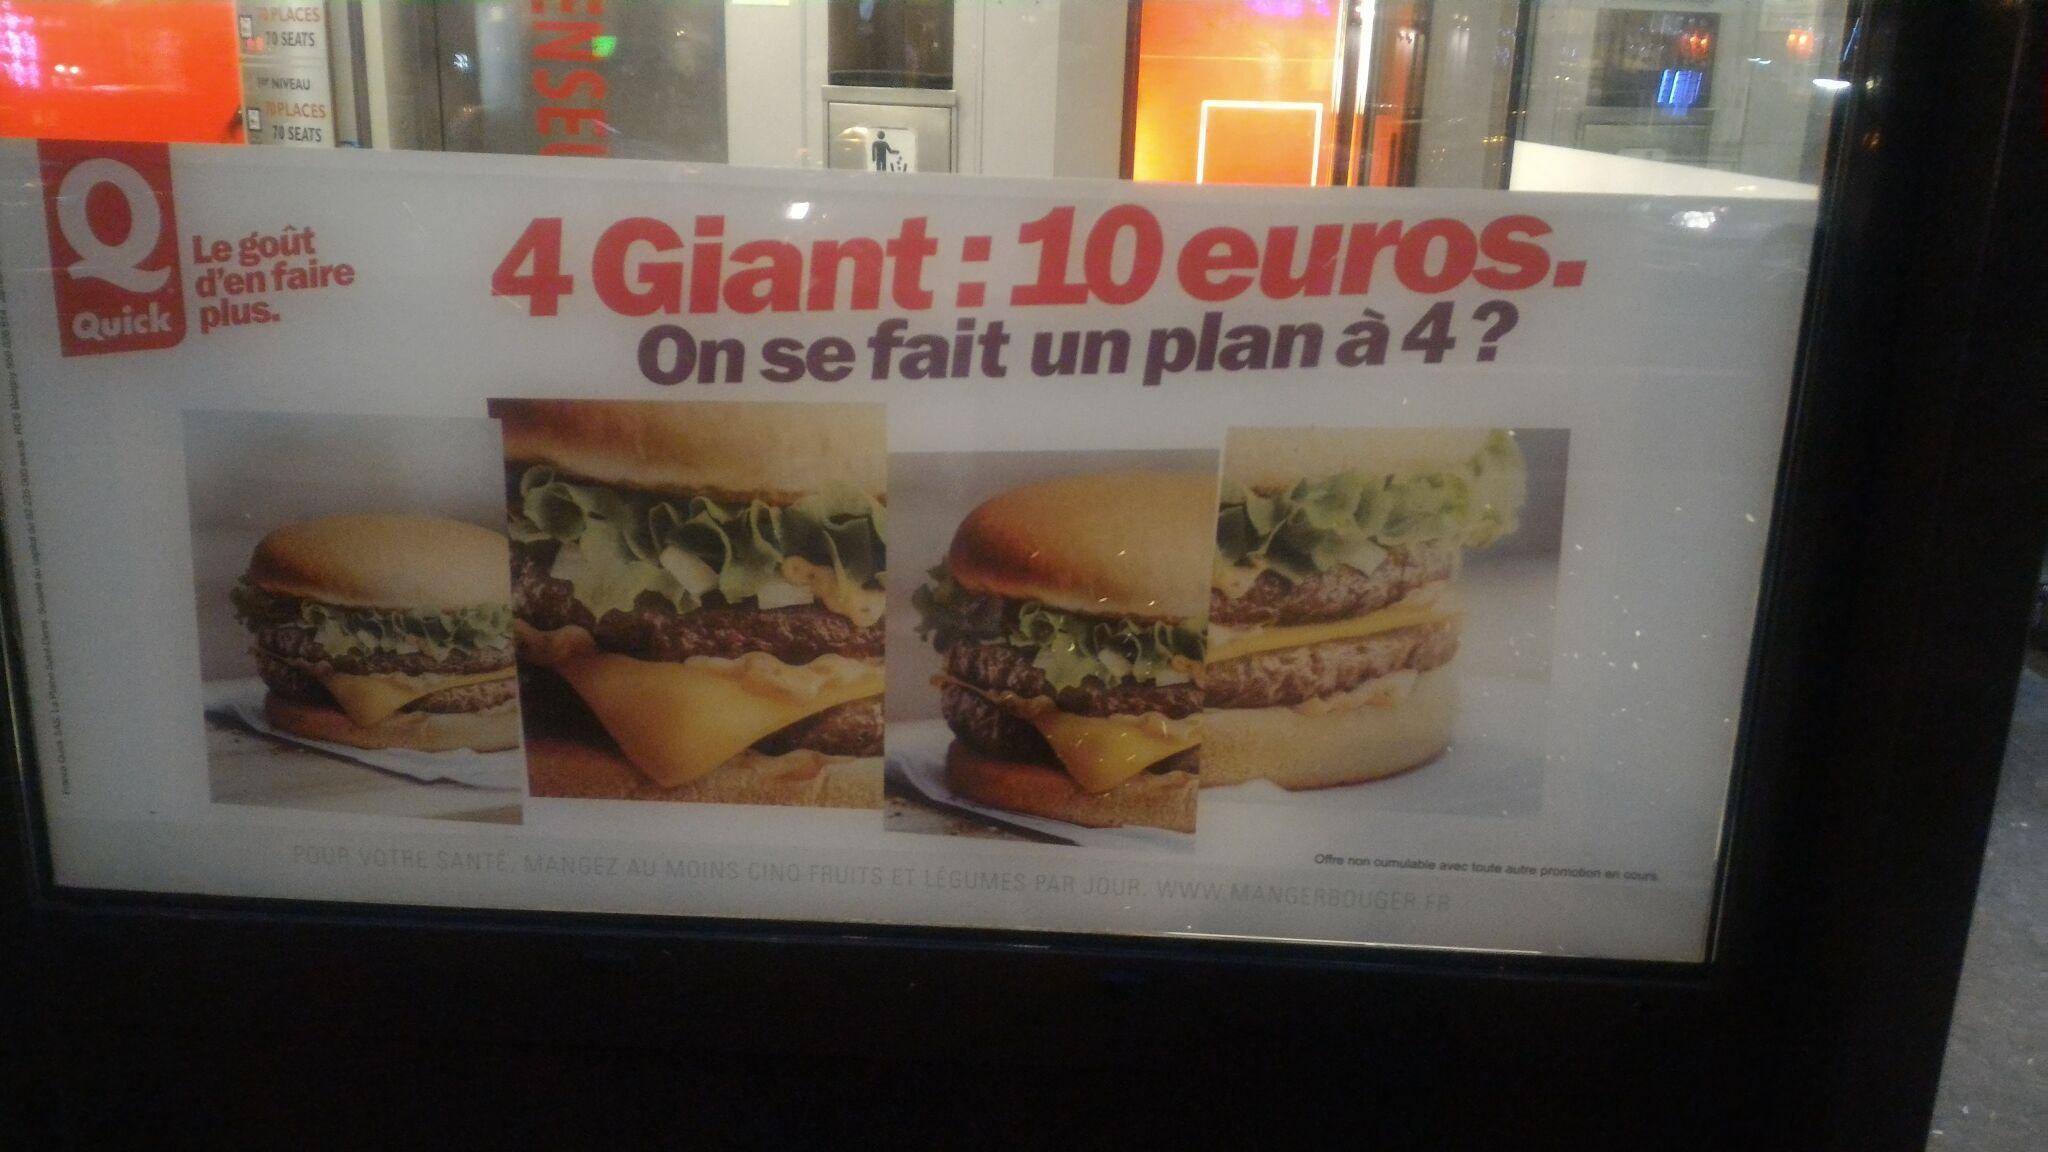 4 Burgers Giant